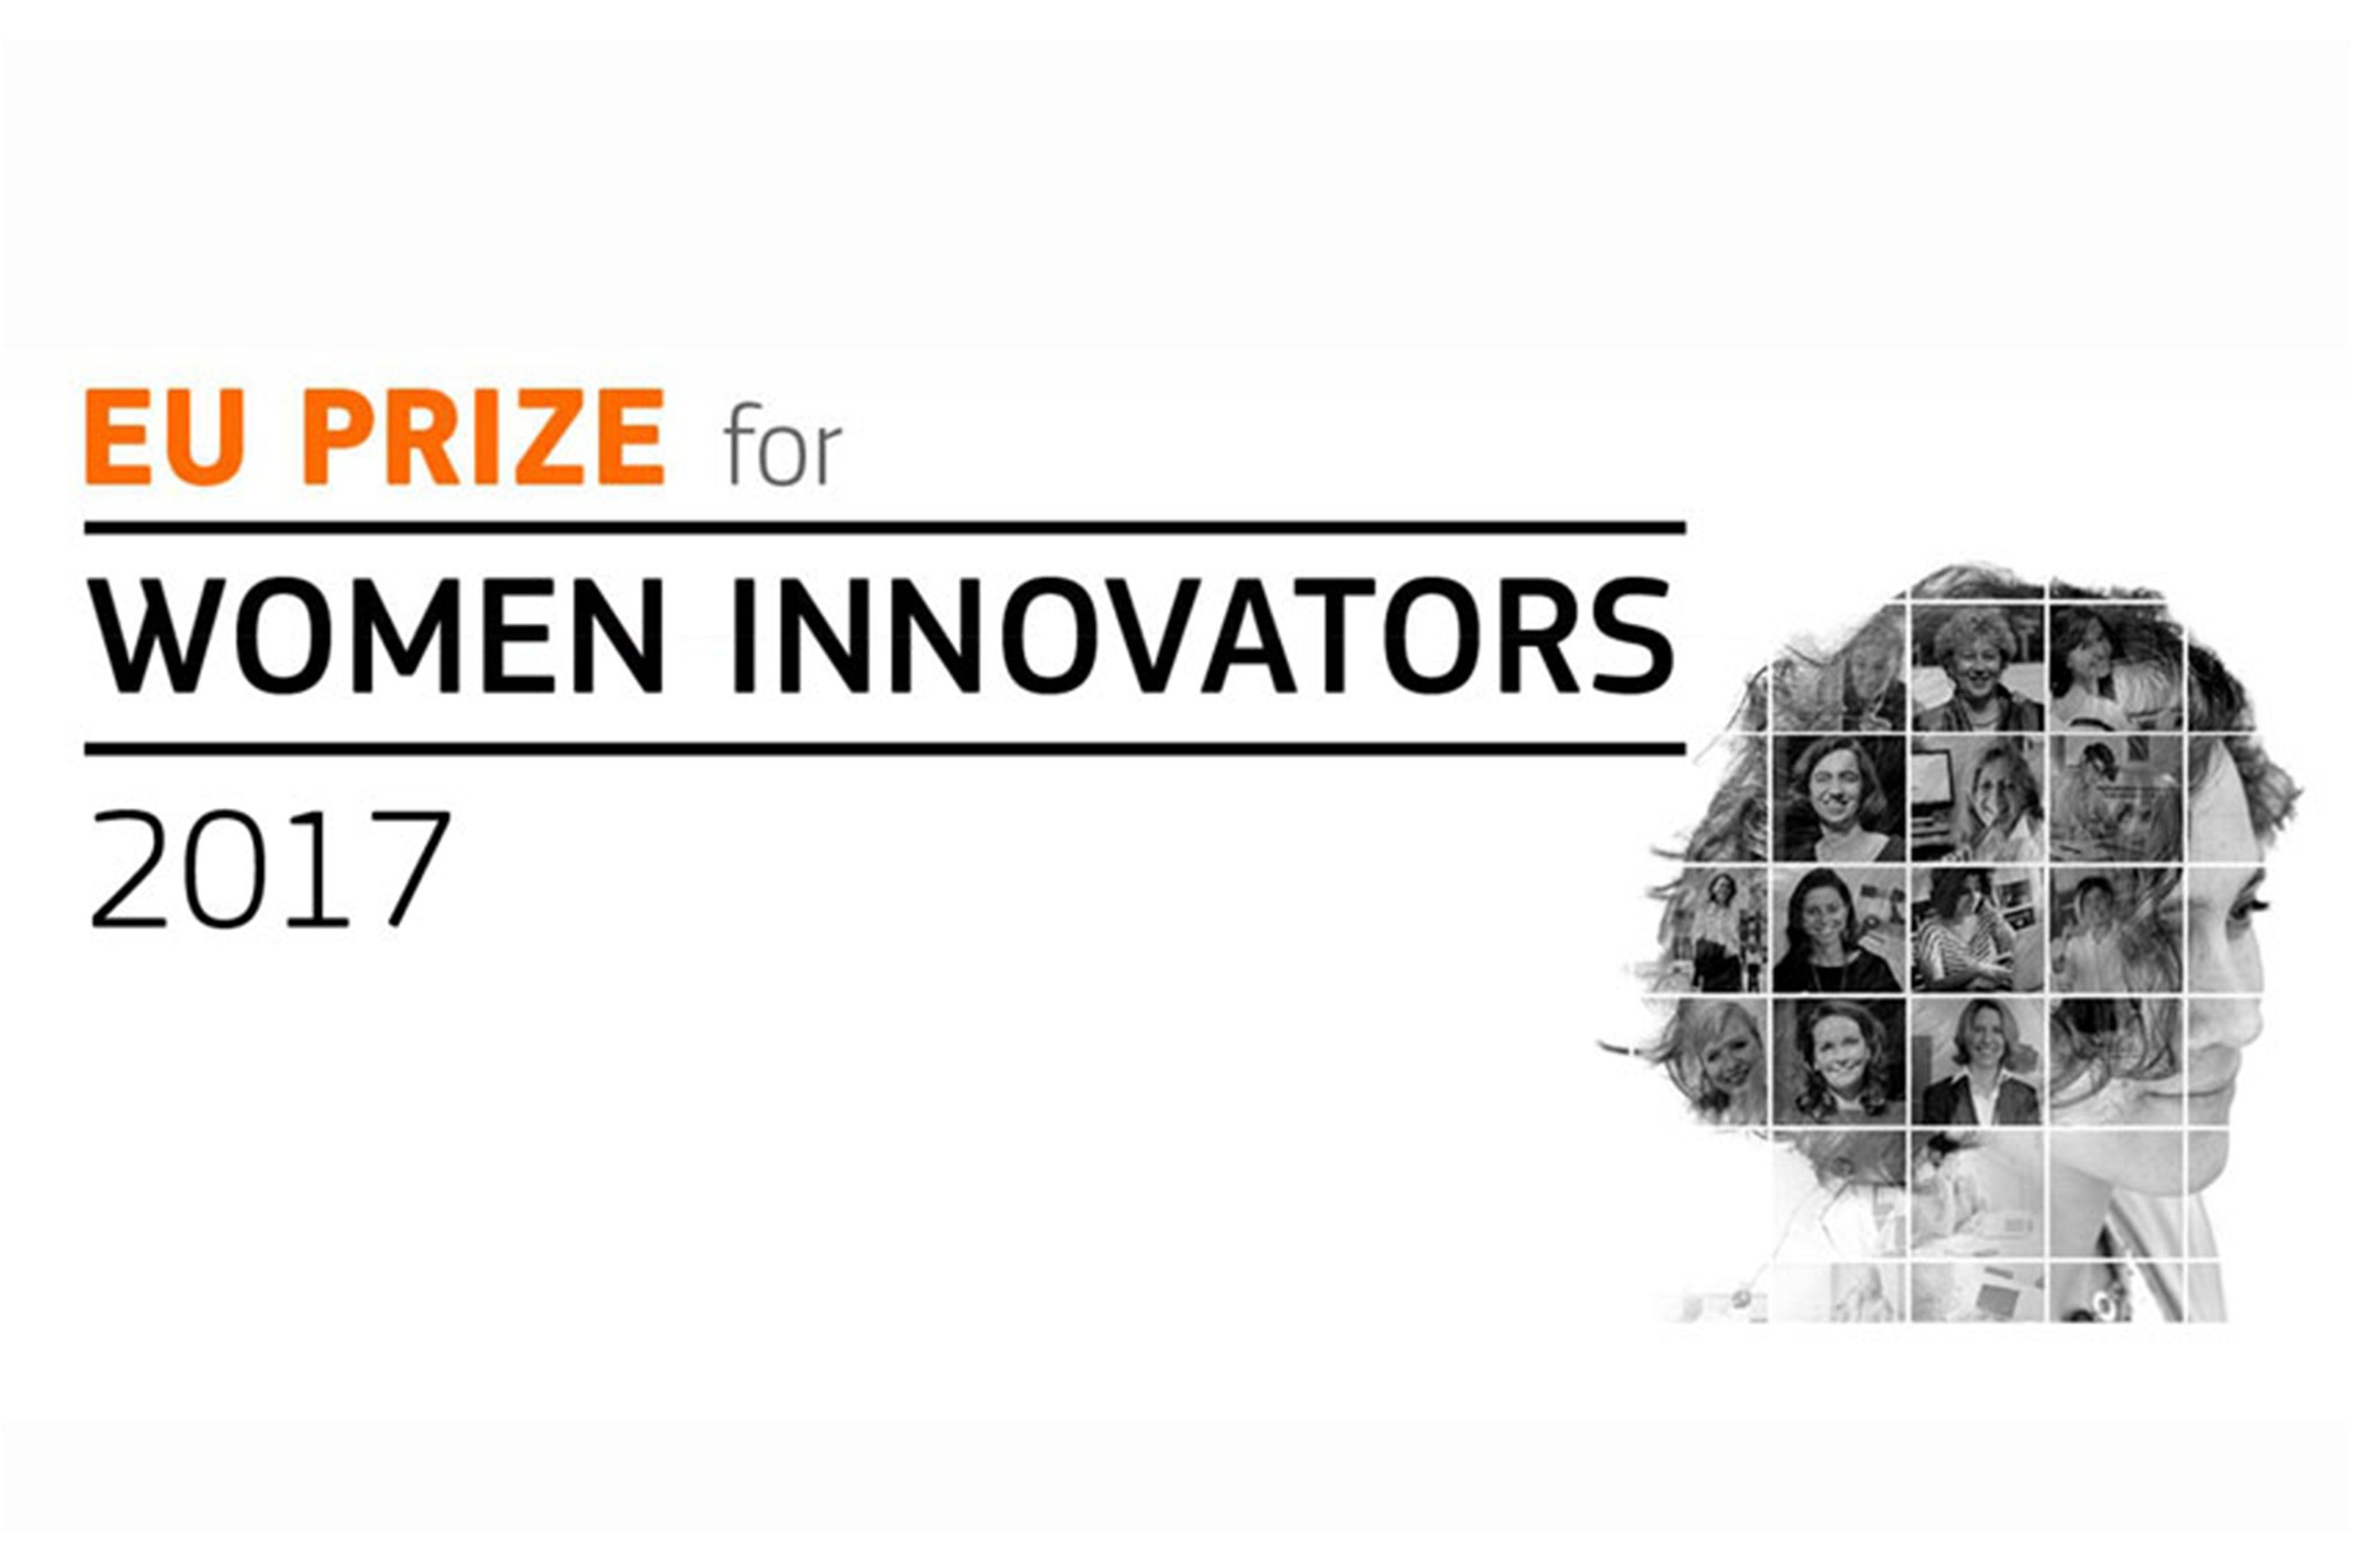 EU price for women innovative entreprenerus 2017